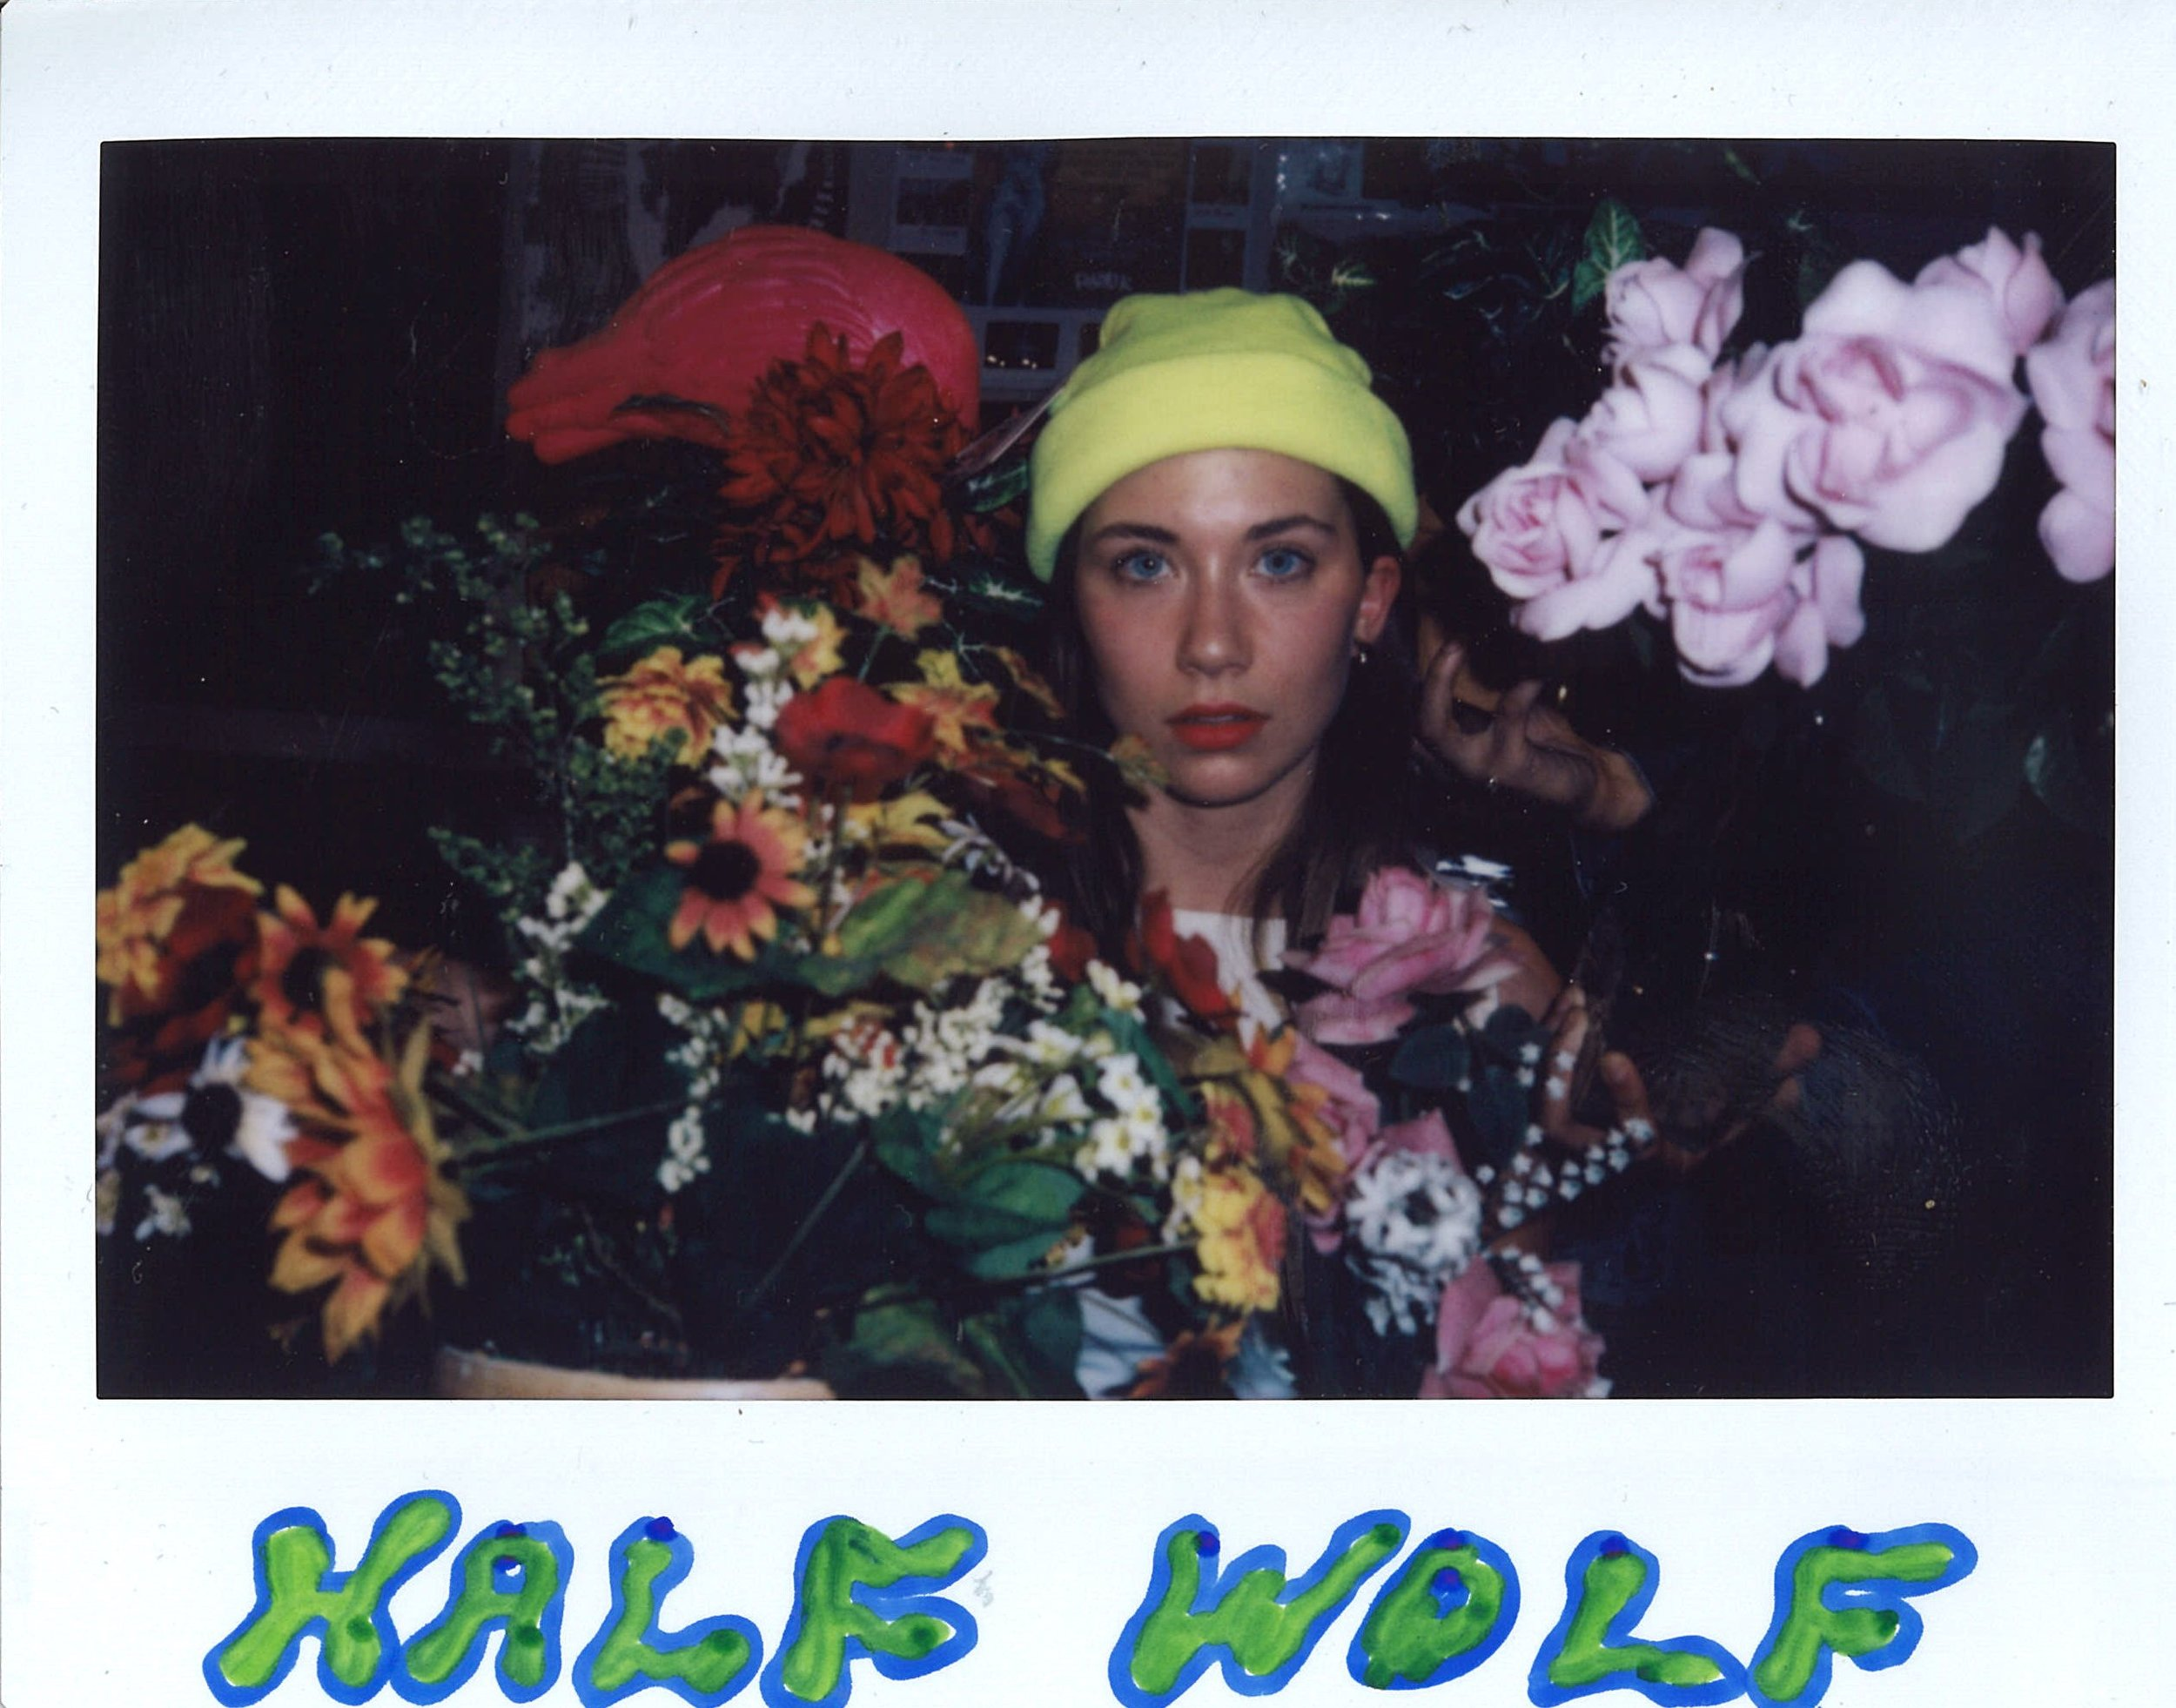 HALF_WOLF.jpg